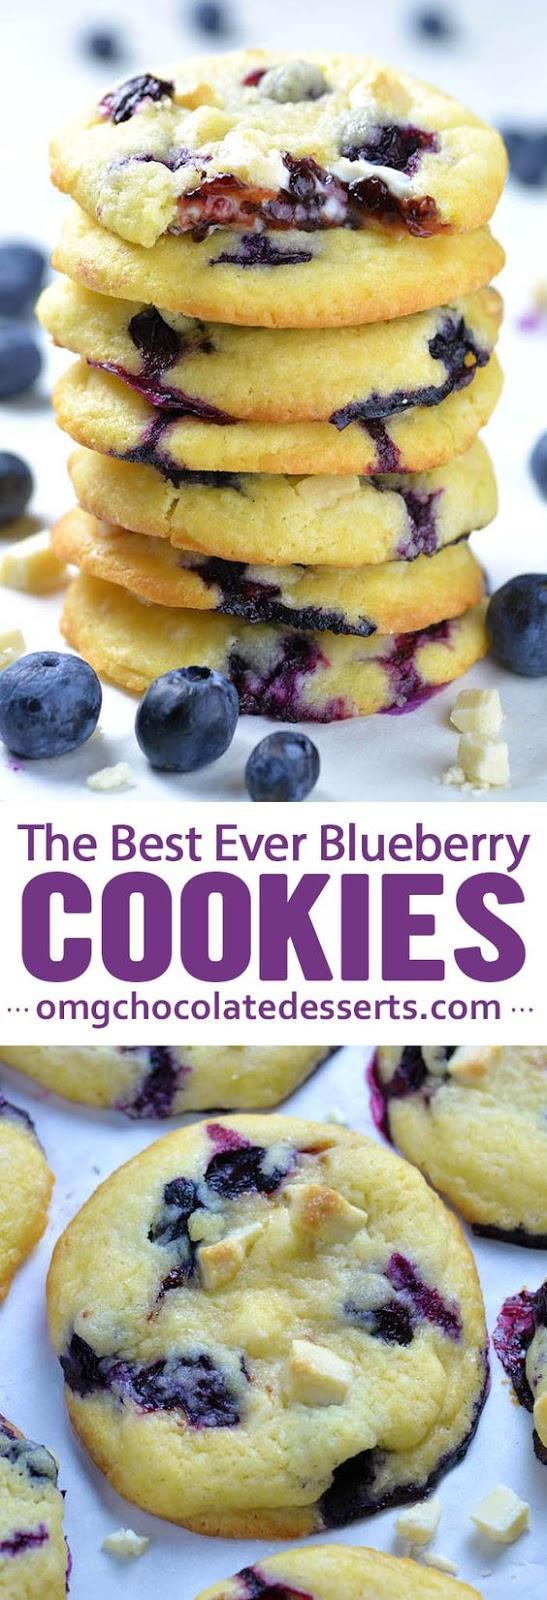 Best Ever Blueberry Cookies #bestever #blueberry #cookies #cookierecipes